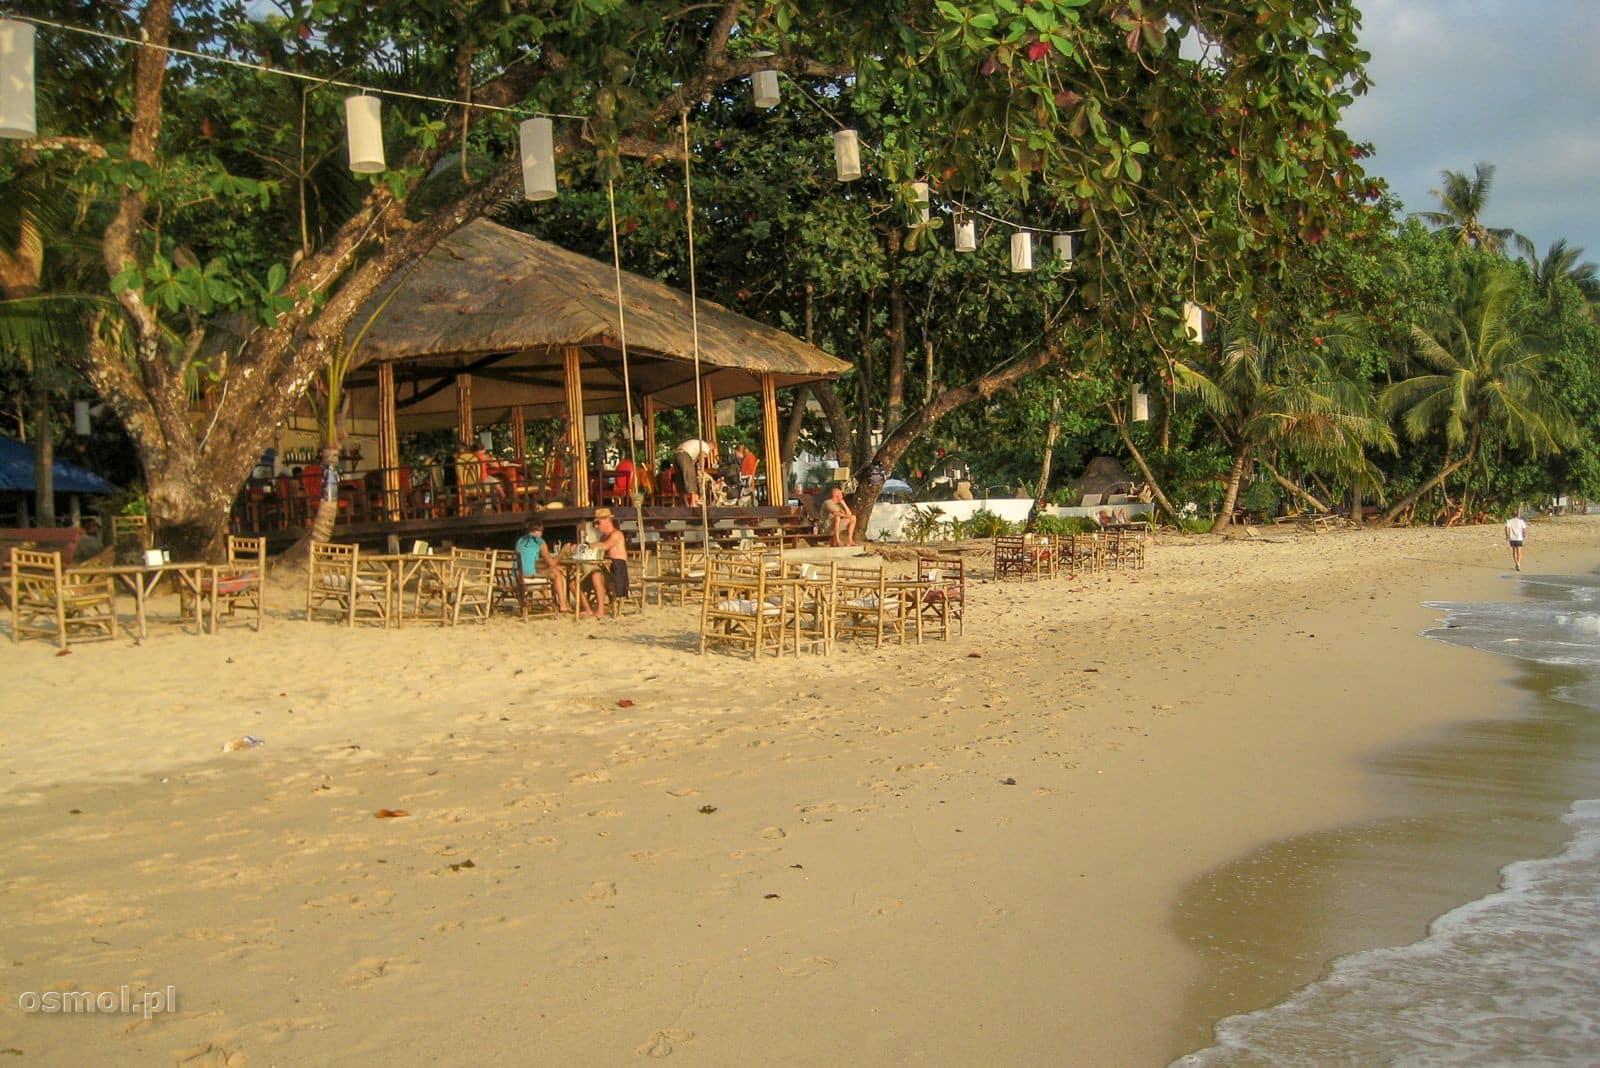 Knajpka na jednaj z plaż na Koh Chang